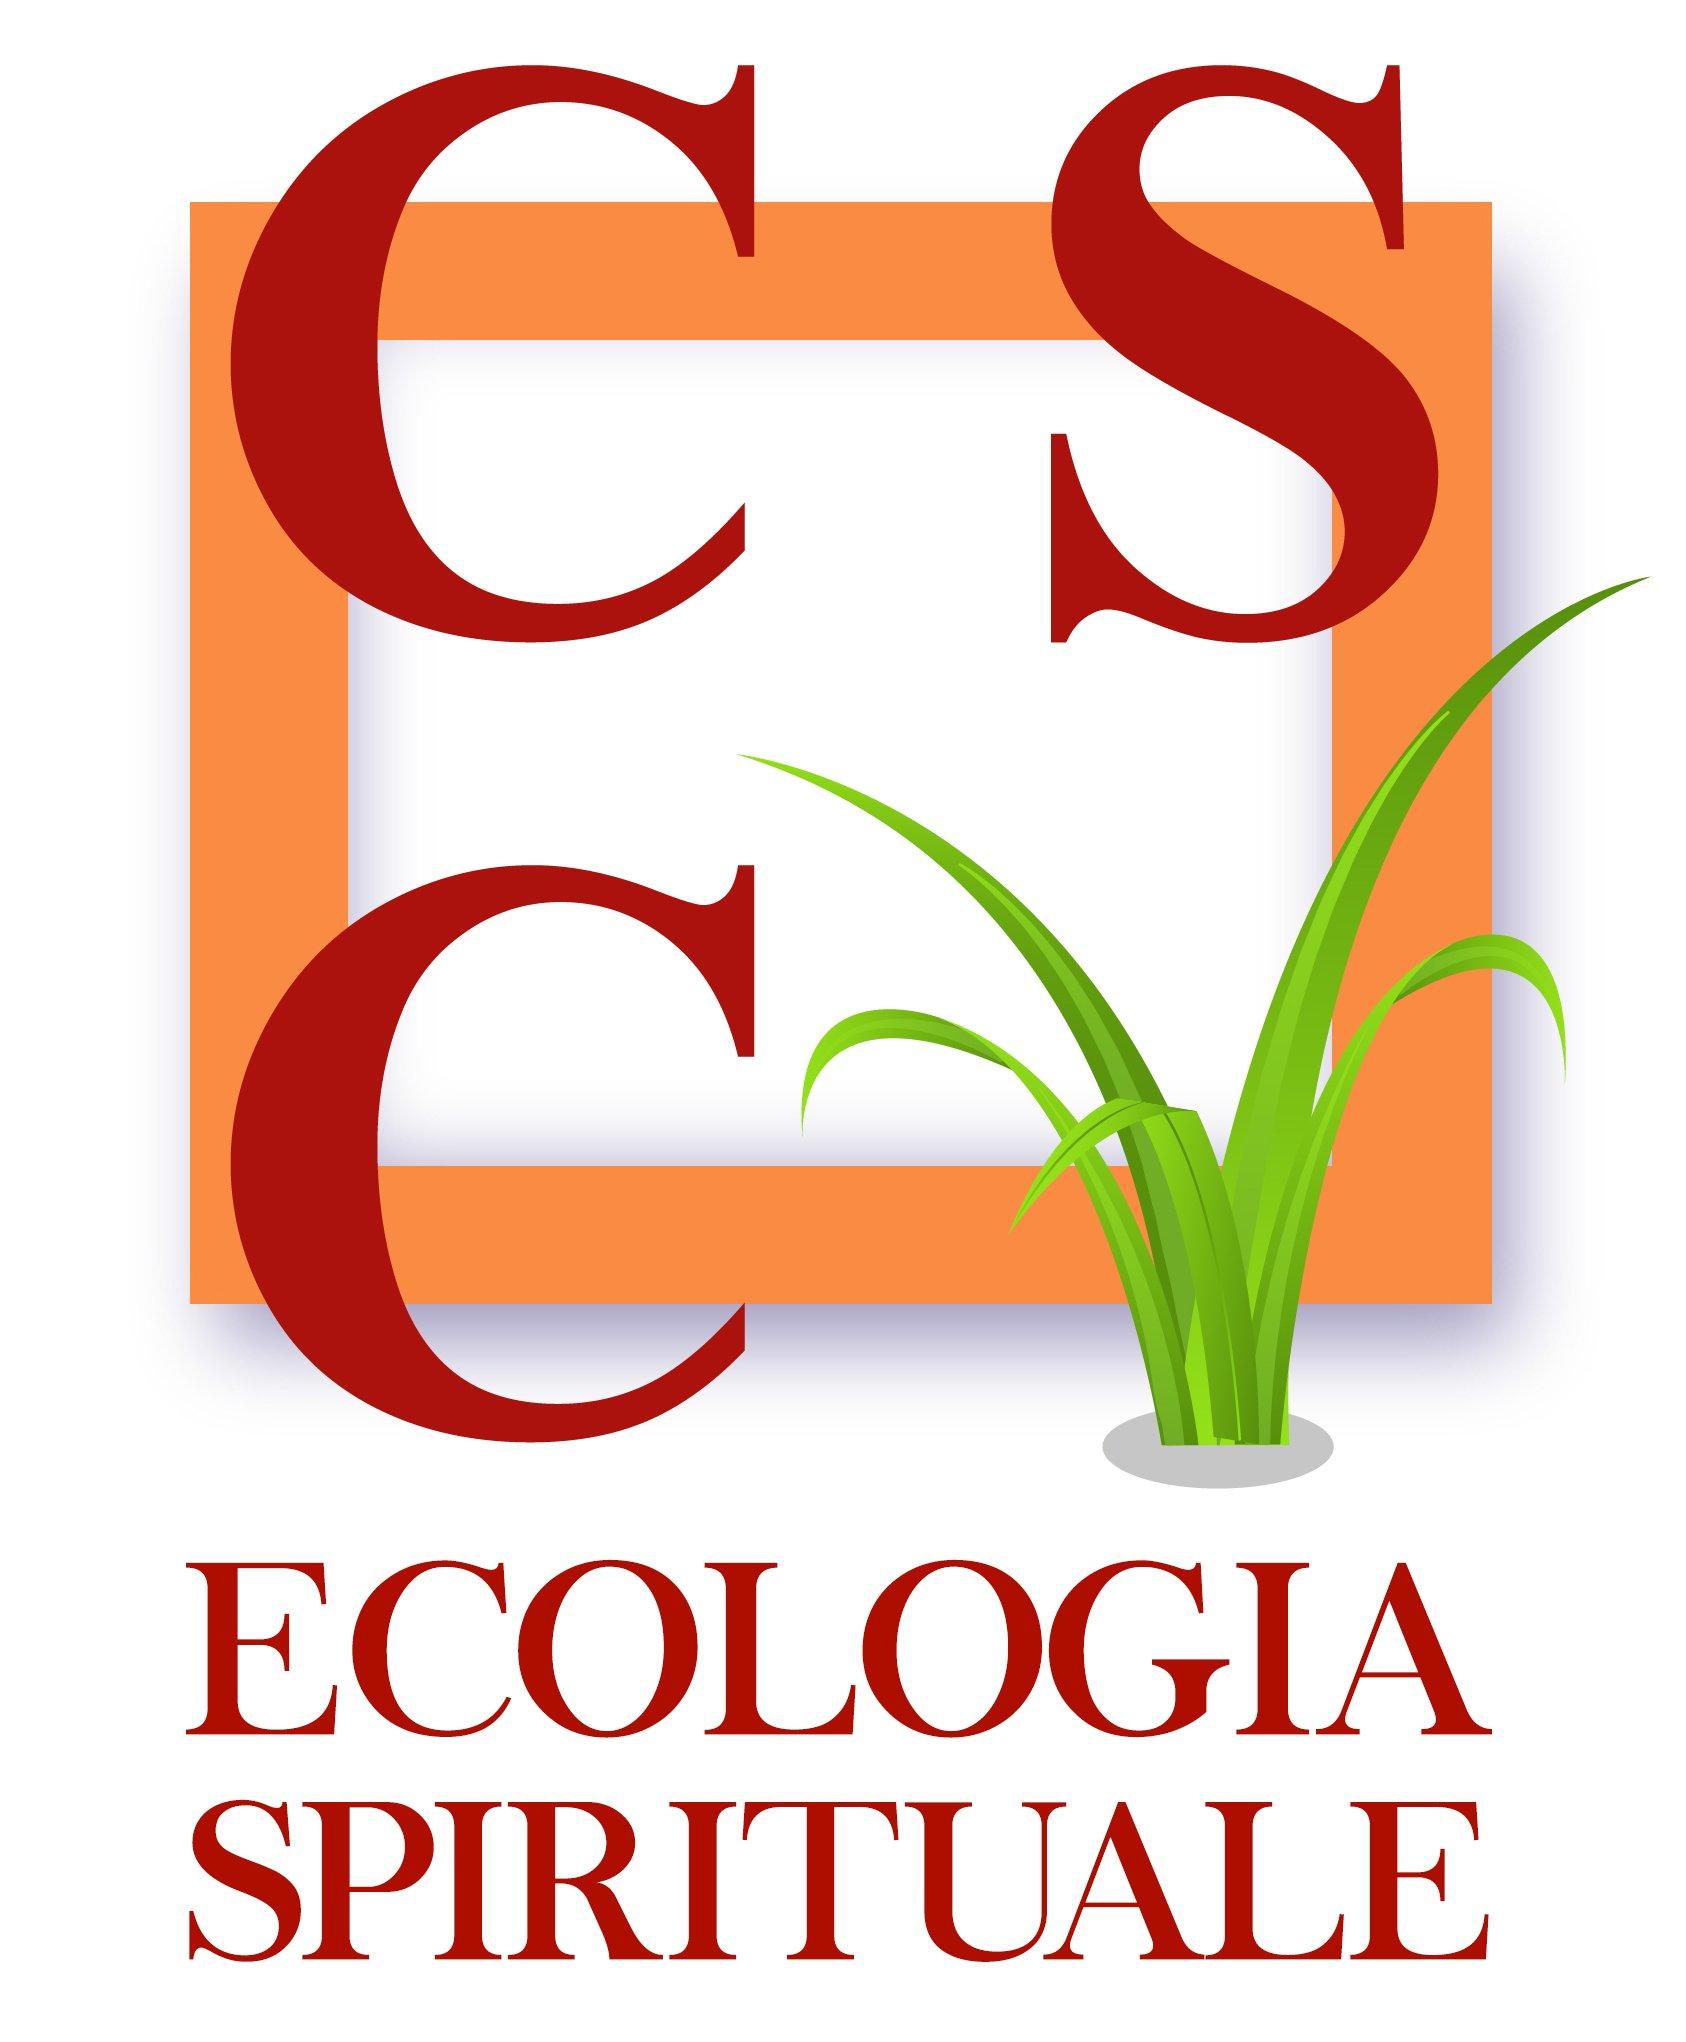 Centro Studi Cristiani Vegetariani